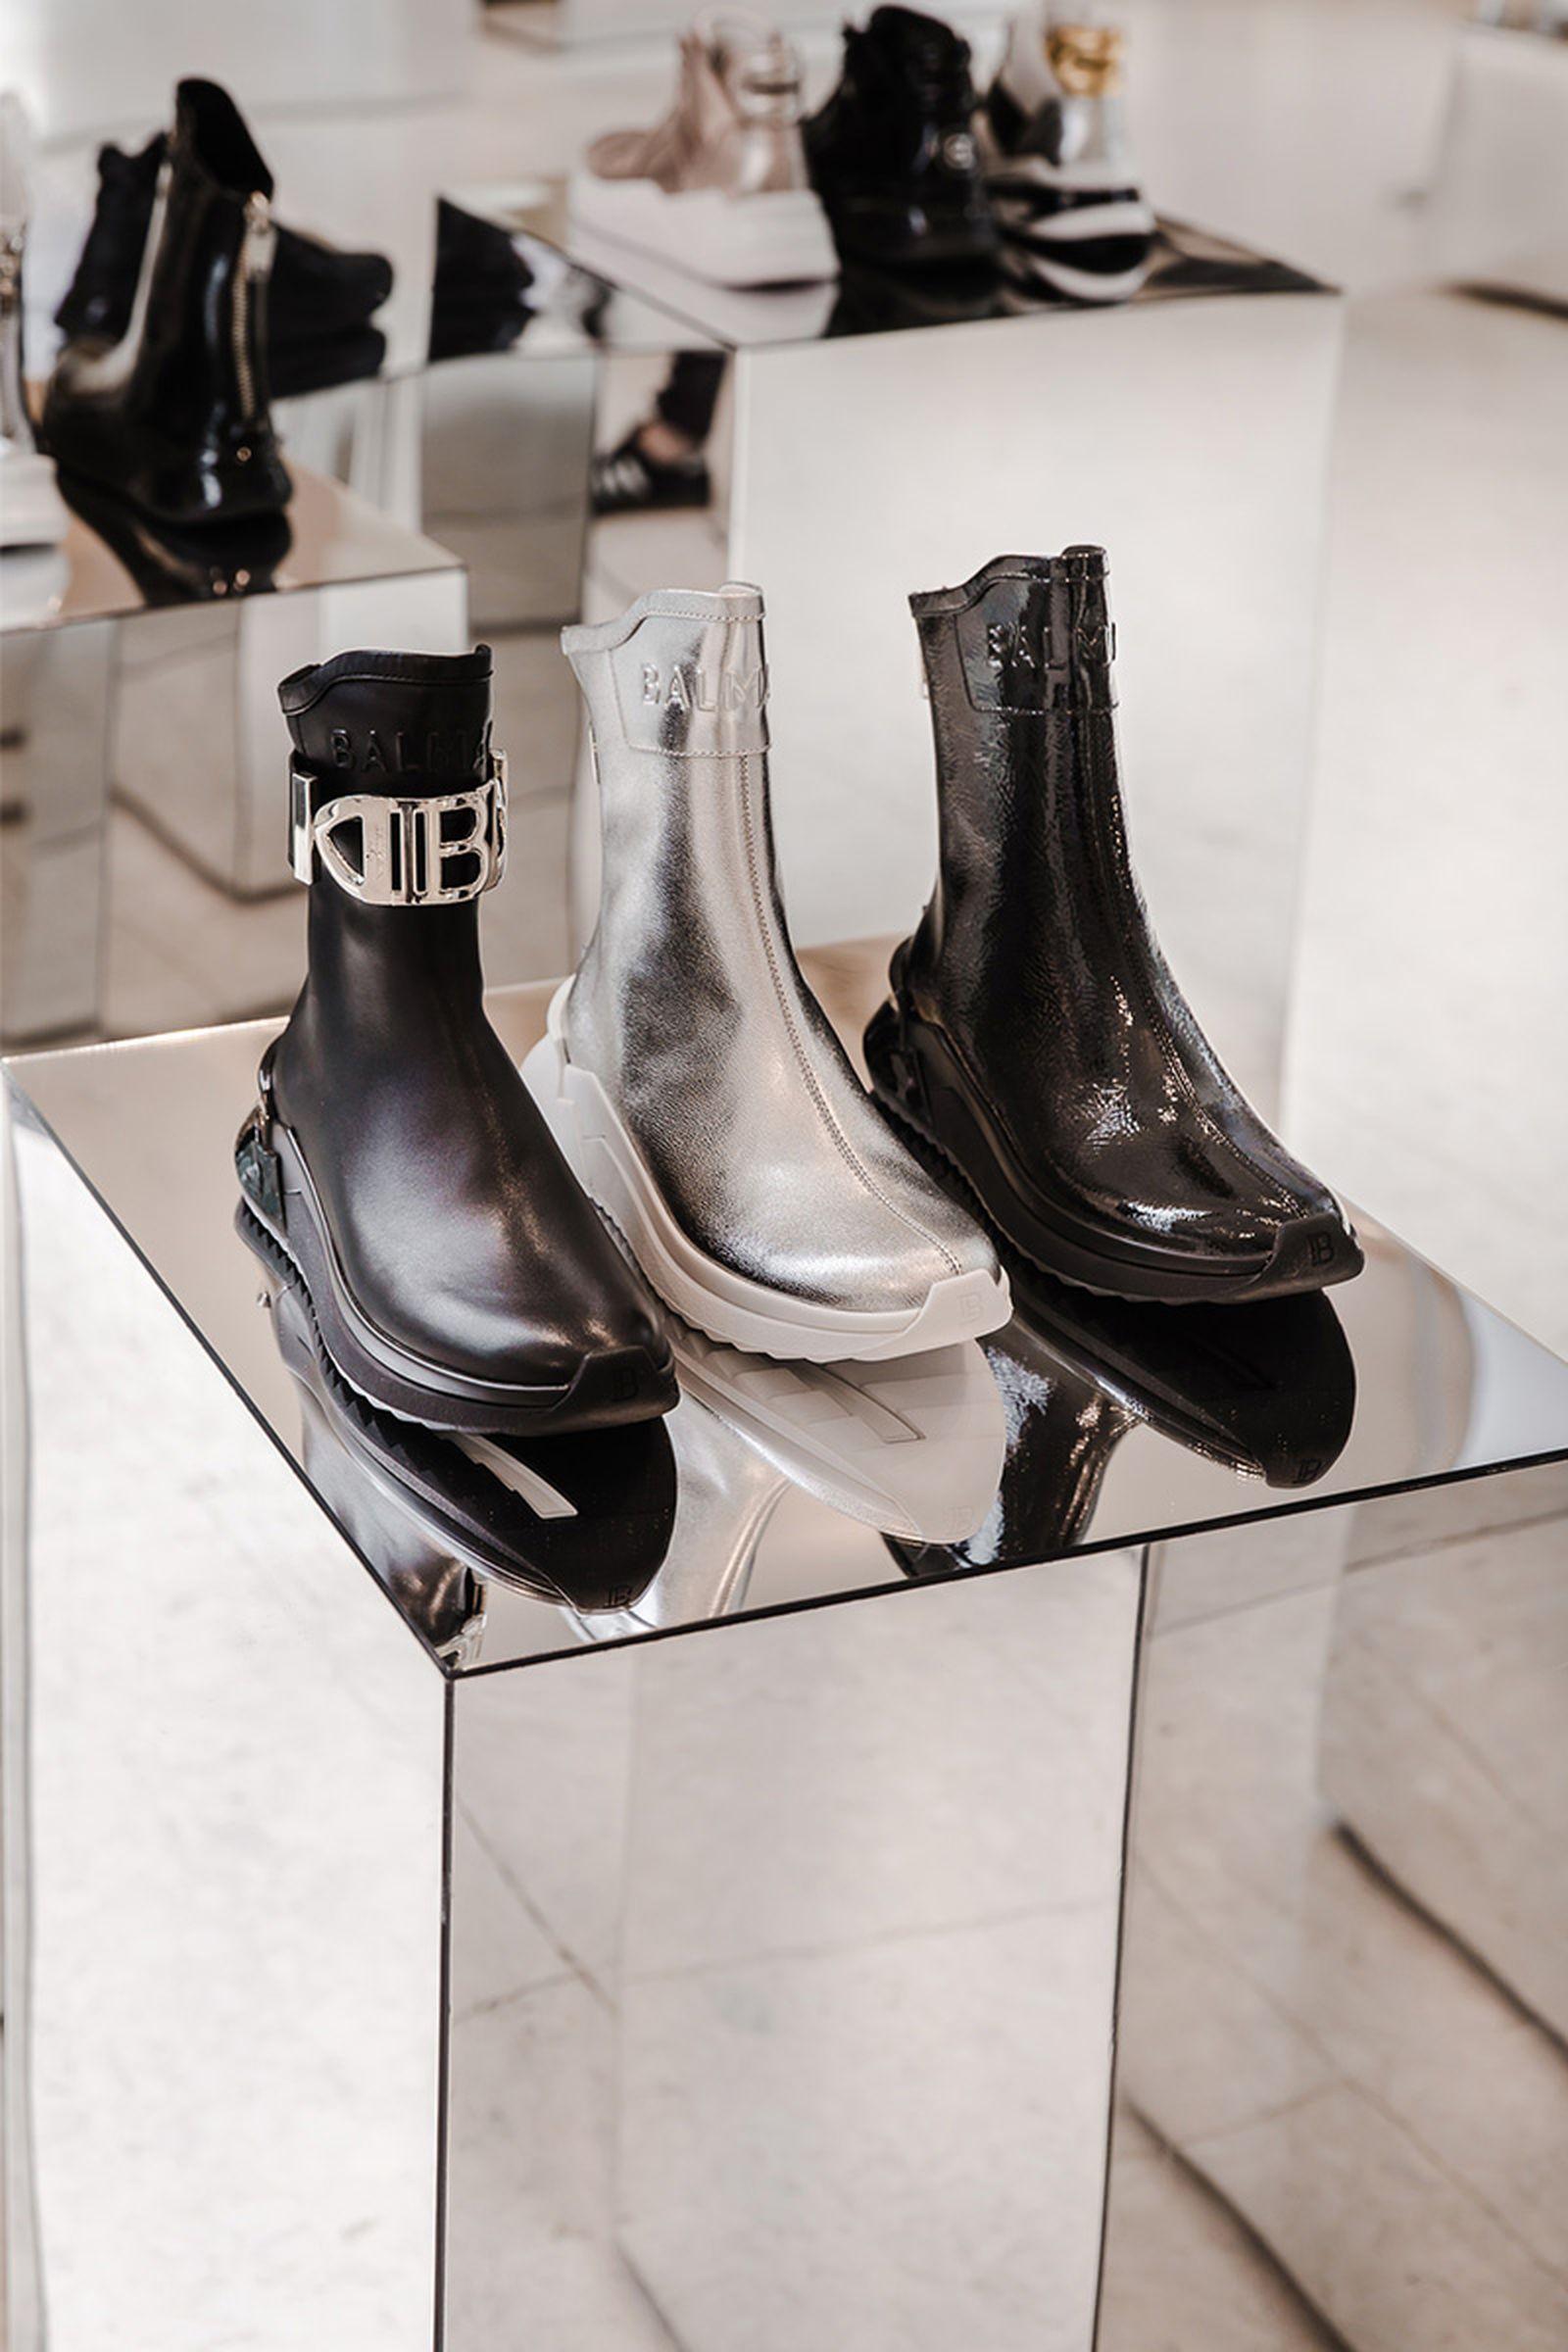 balmain selfridges london sneaker customization pop up